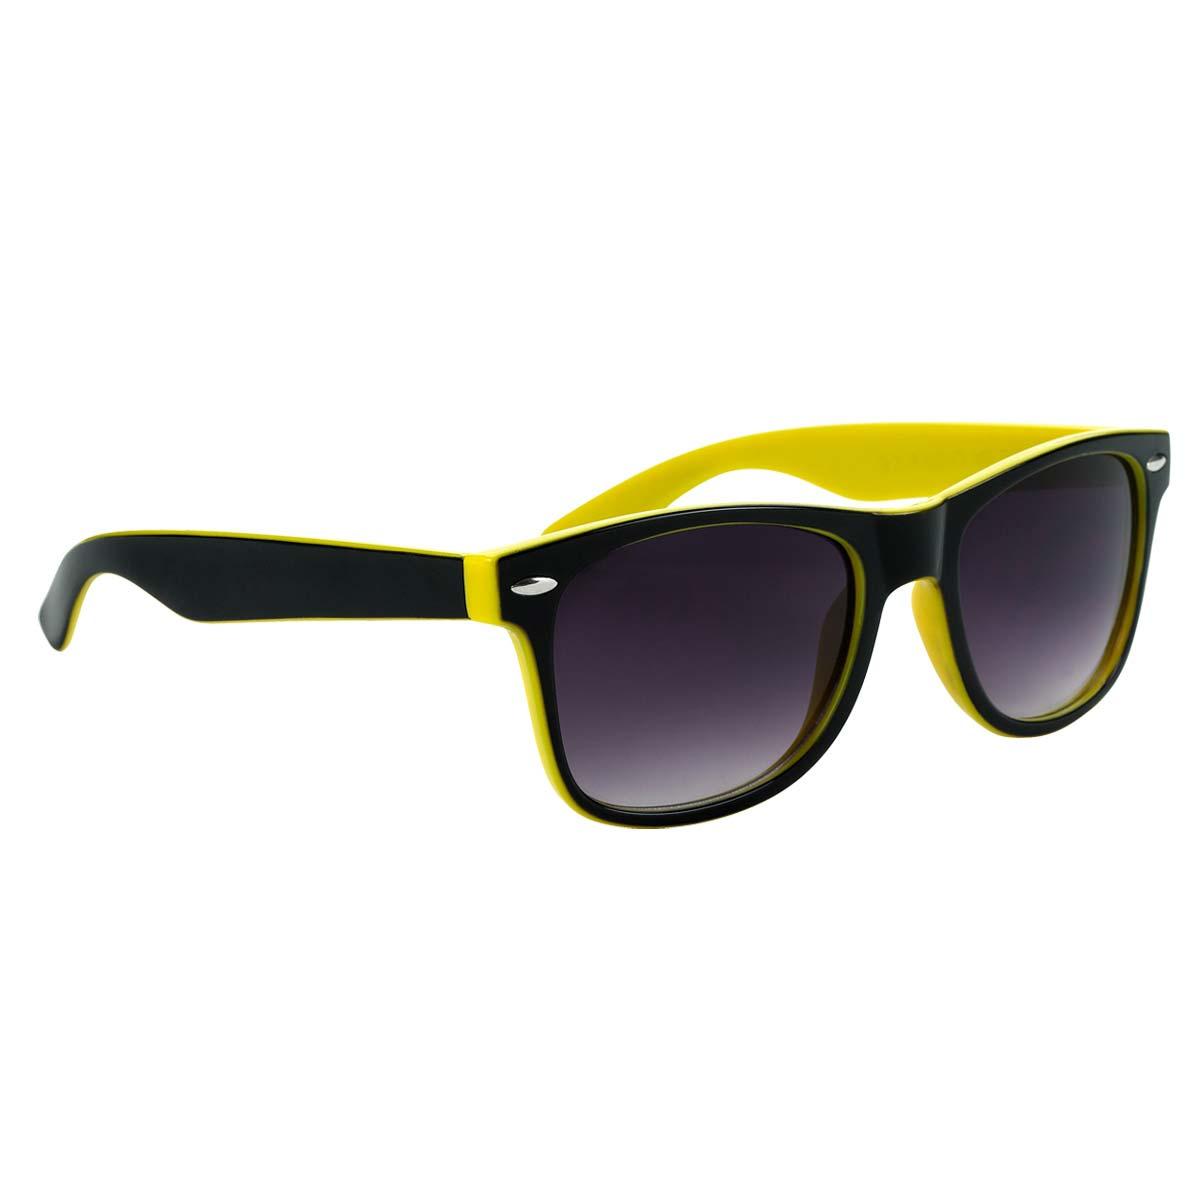 6224 yellow black